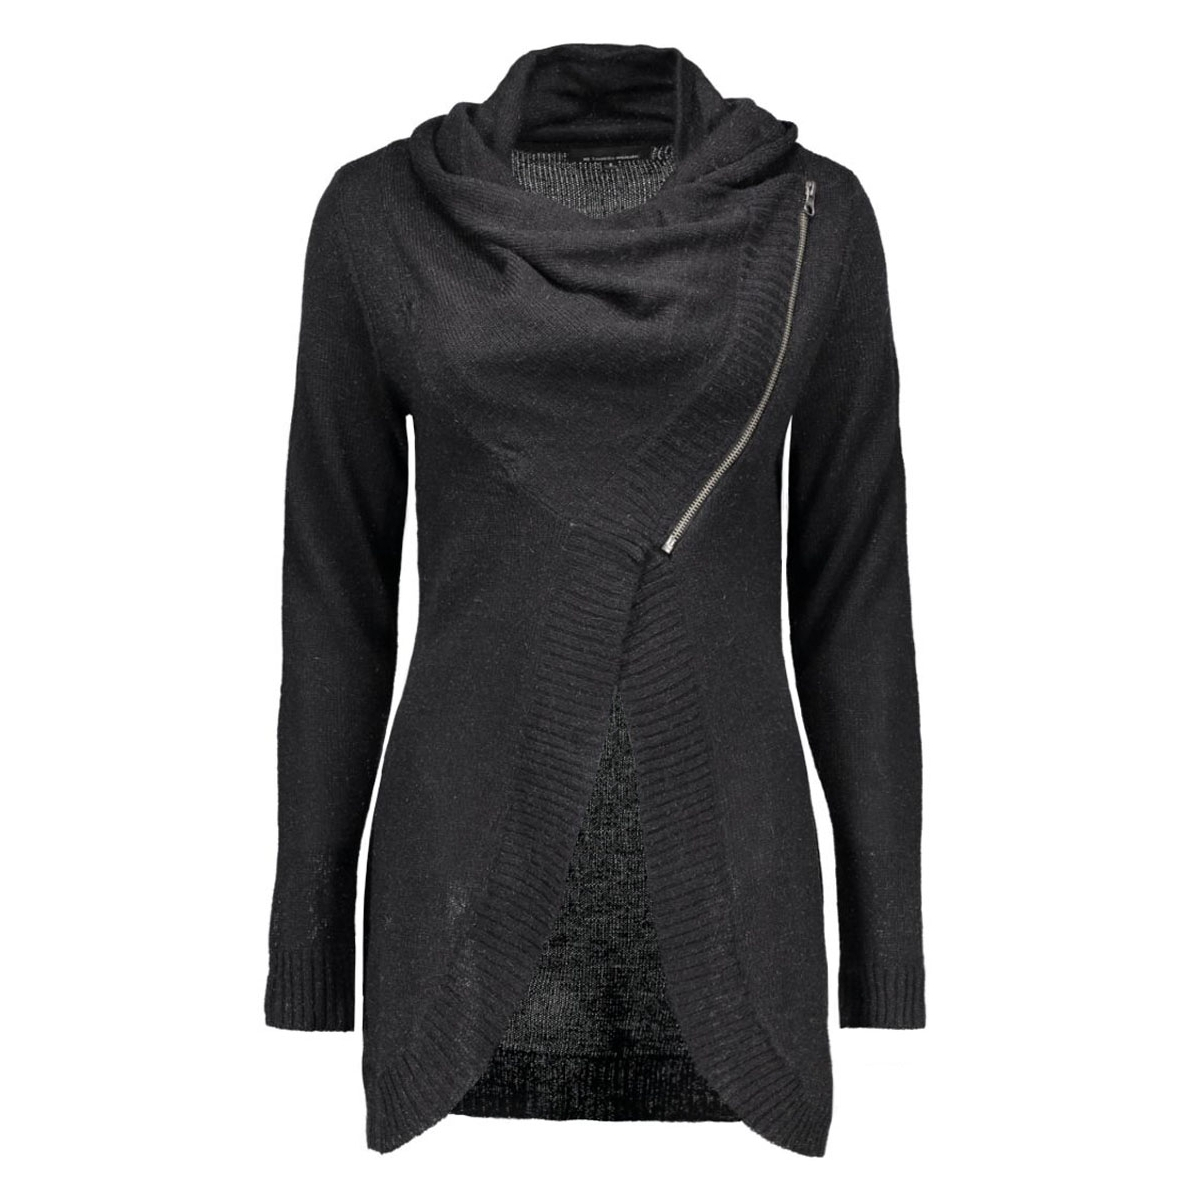 onlnew hayley l/s zip cardigan knt 15100922 only vest black